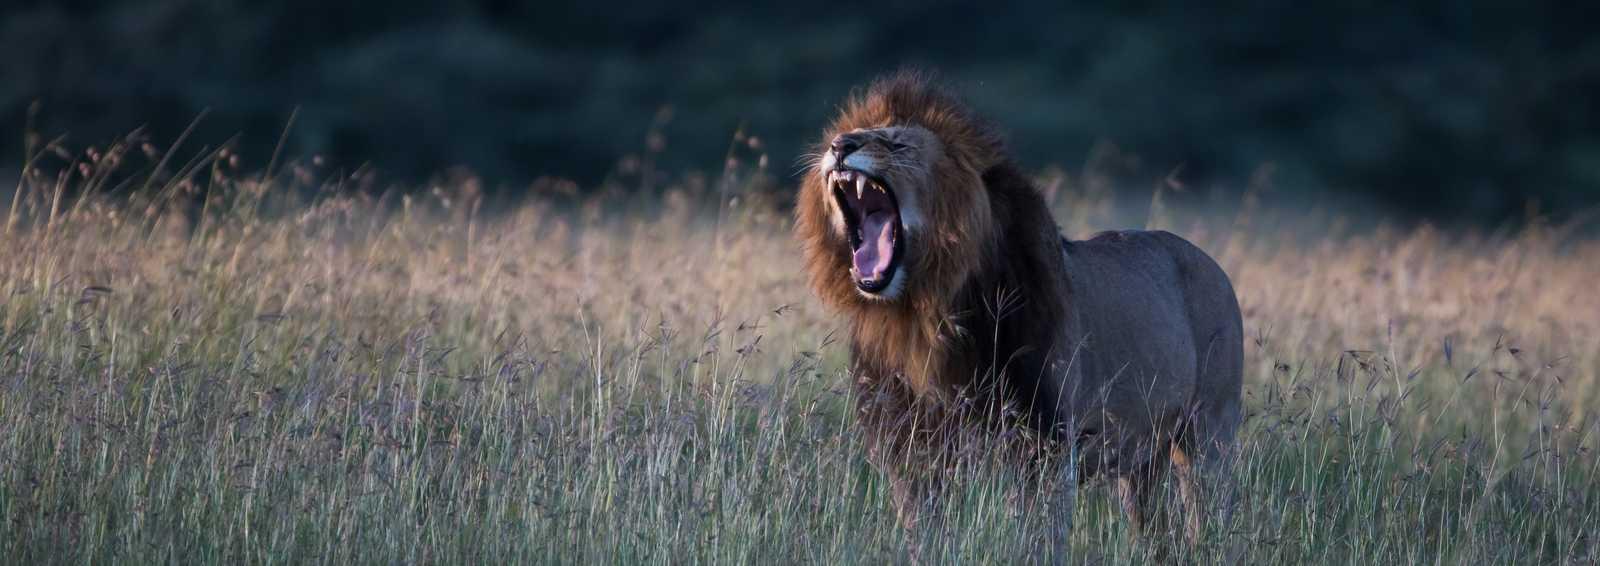 Call of the Wild - Lion, Kenya